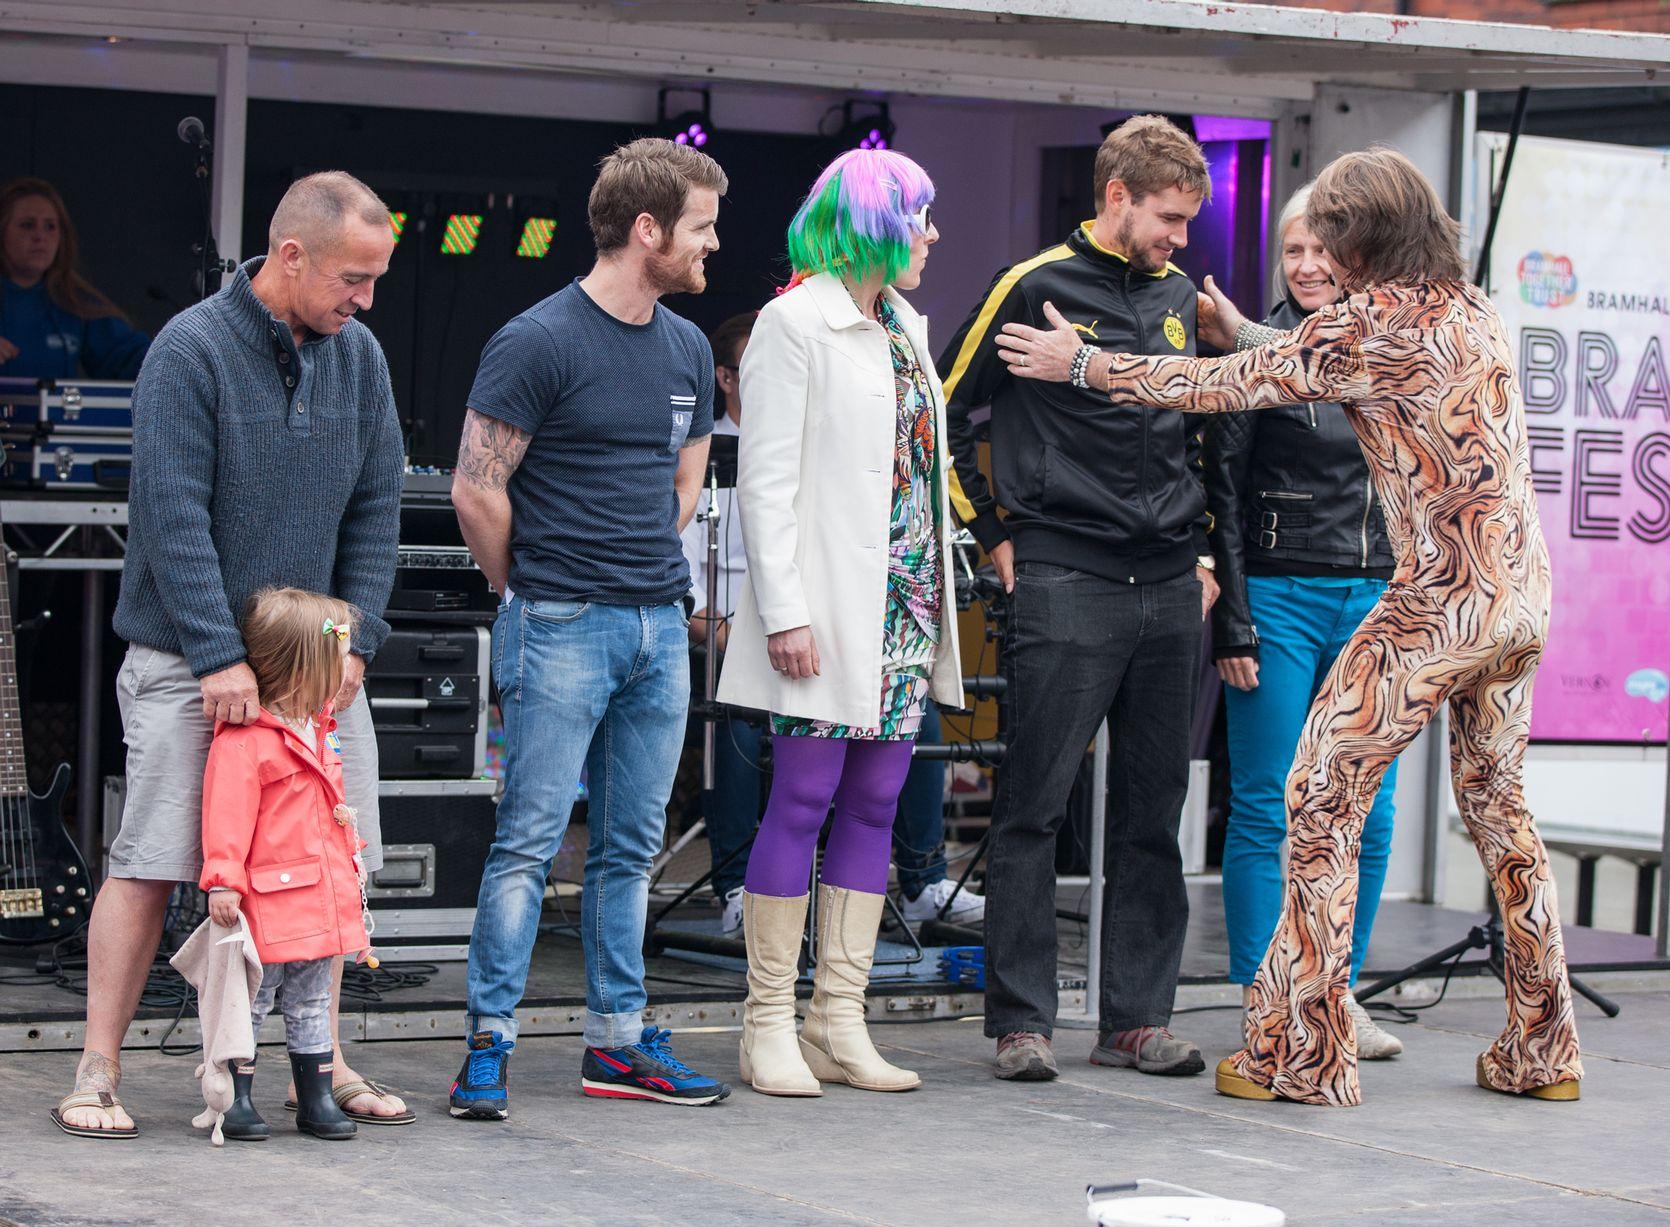 Leroy Lurve I Love Bramhall Festival - image courtesy of Glyn Burgess Photography